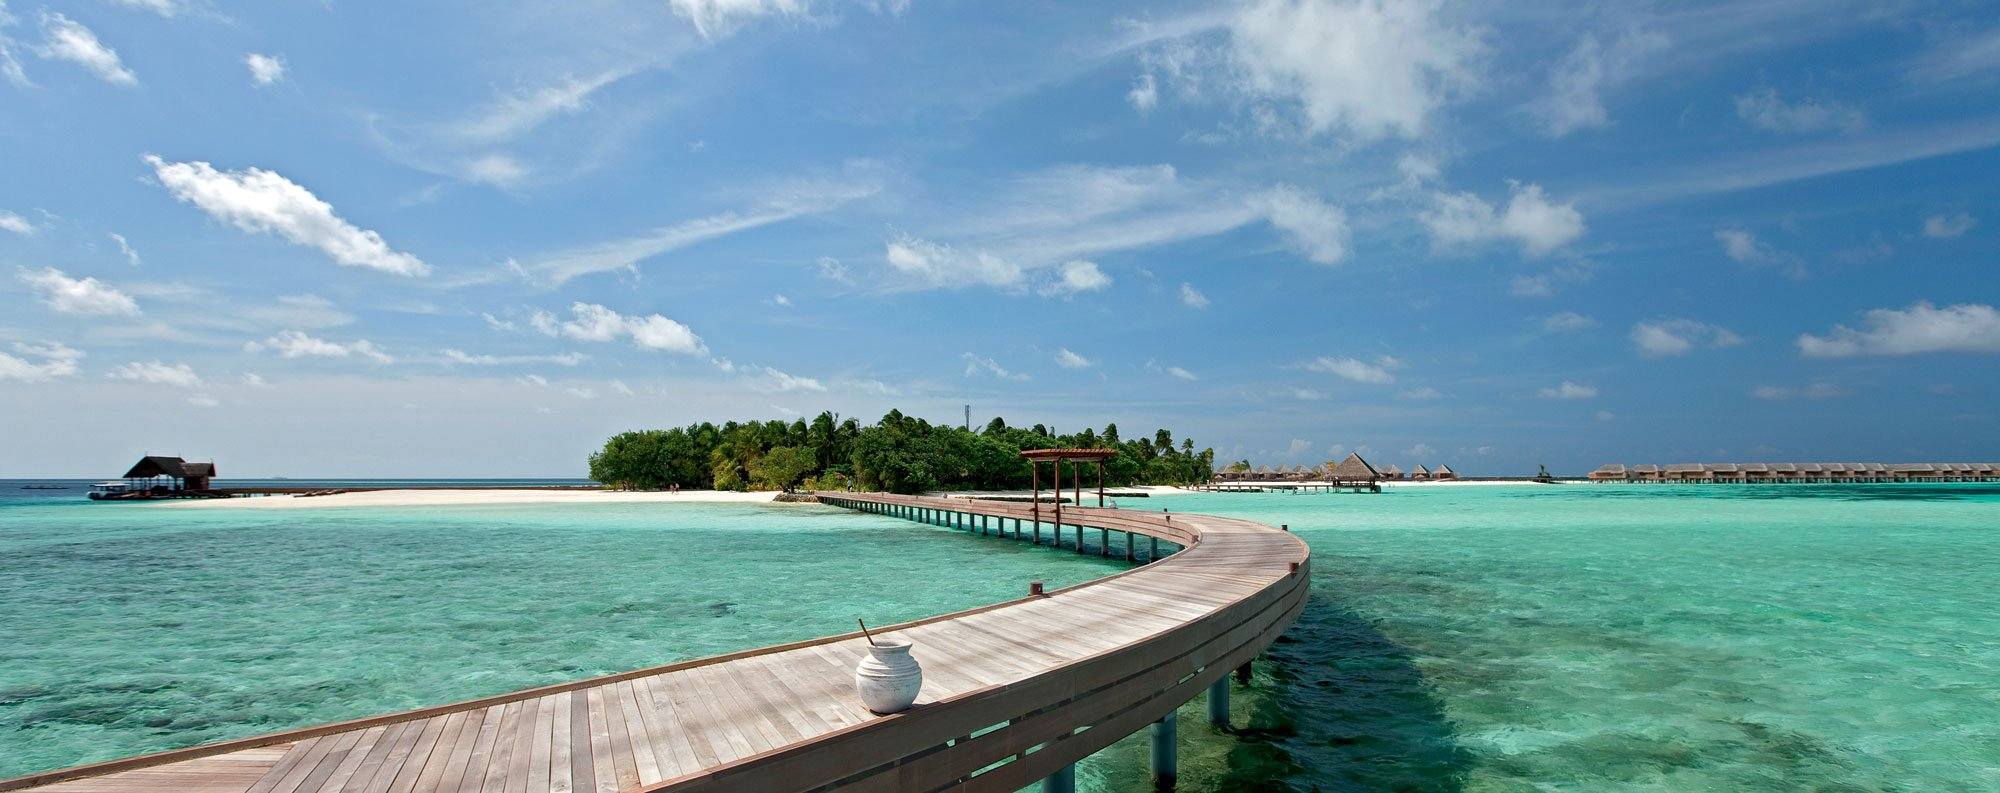 Constance-Moofushi-Maldives-08